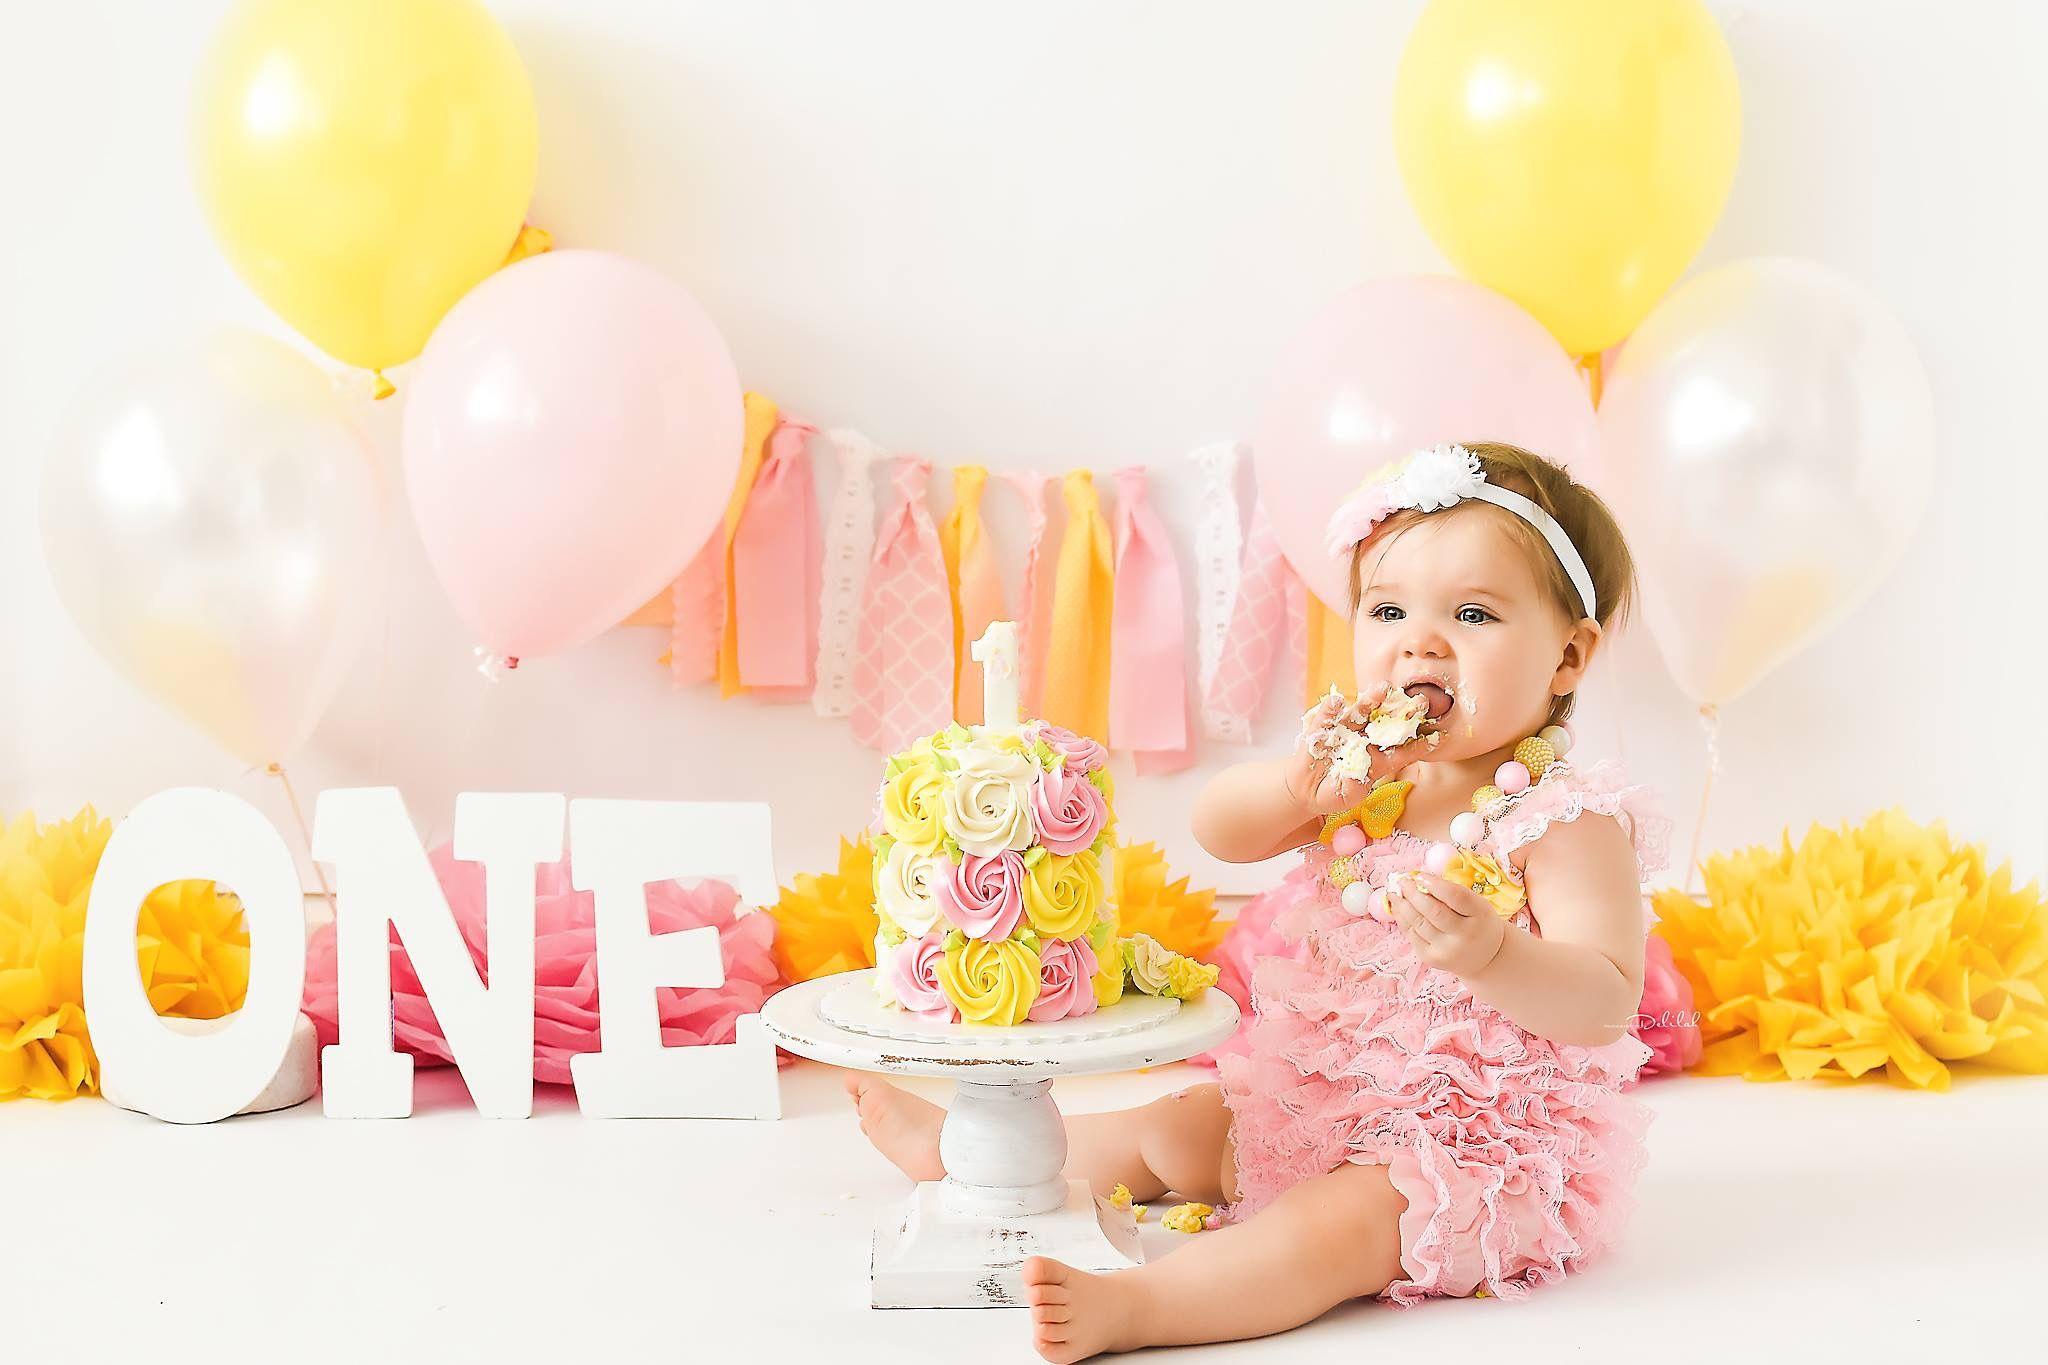 Baby Pink And Yellow Cake Smash Theme With Images Cake Smash